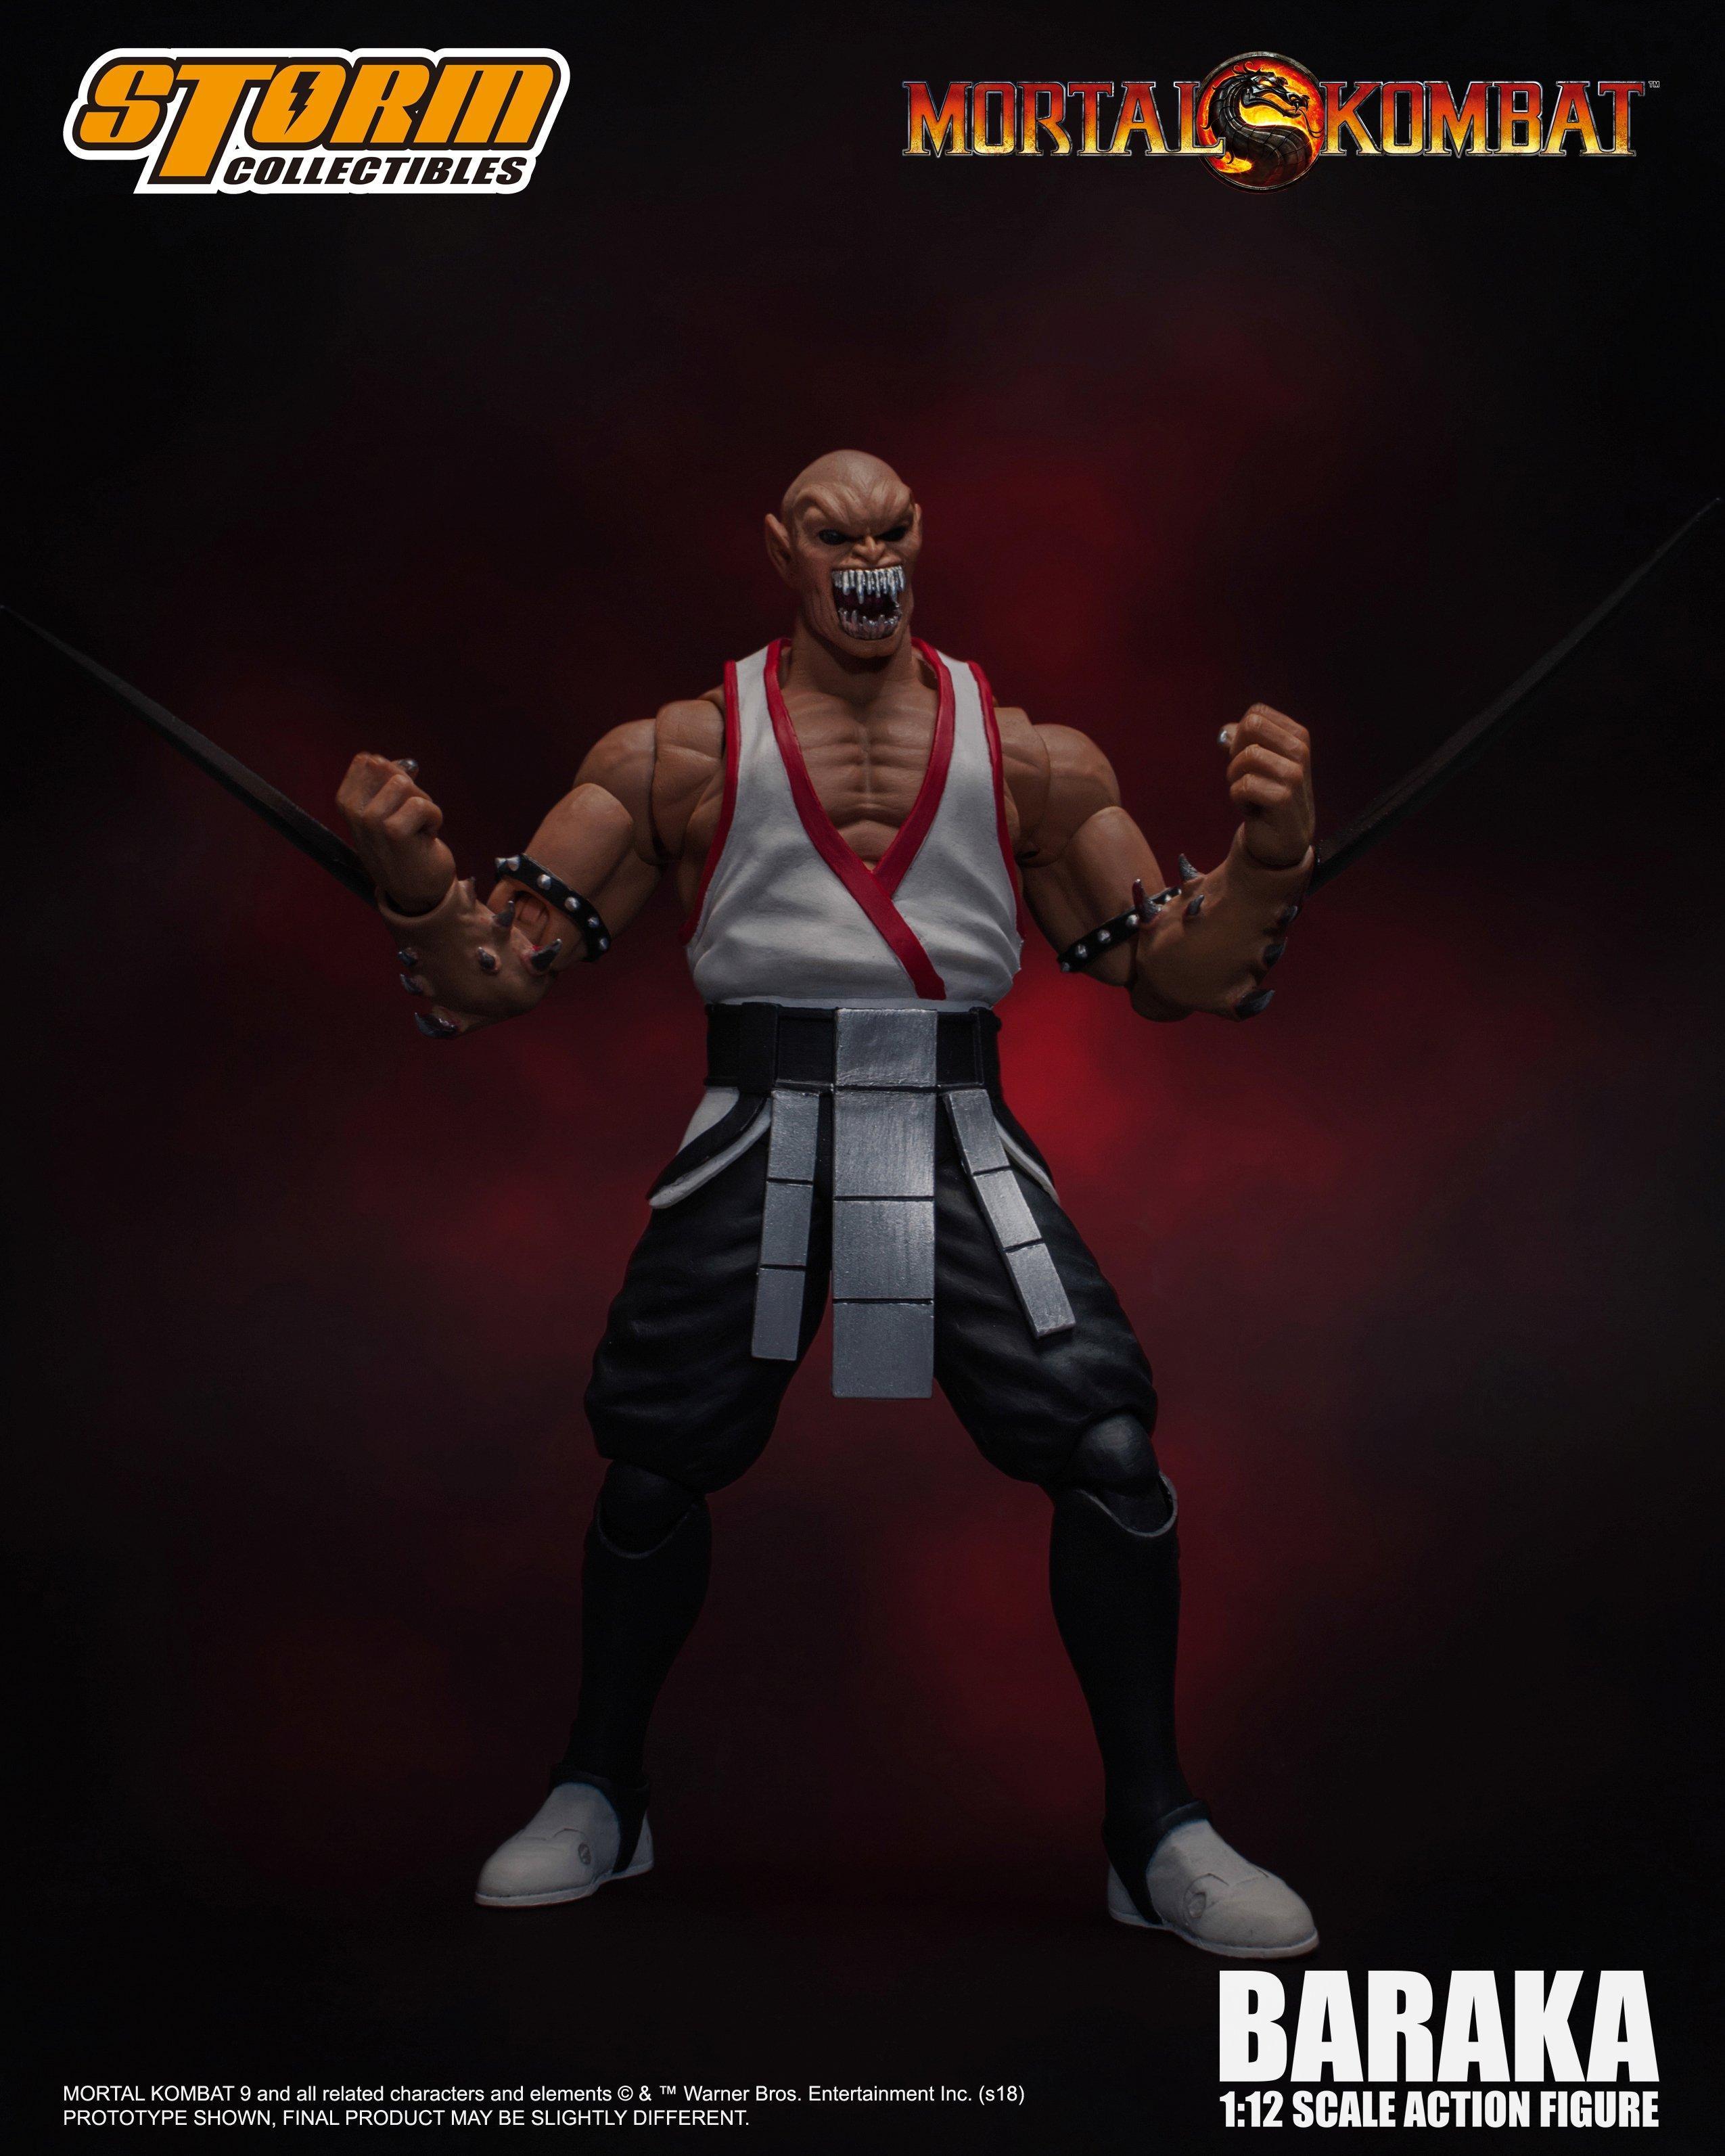 Storm Collectibles Mortal Kombat Baraka Action Figure | GameStop